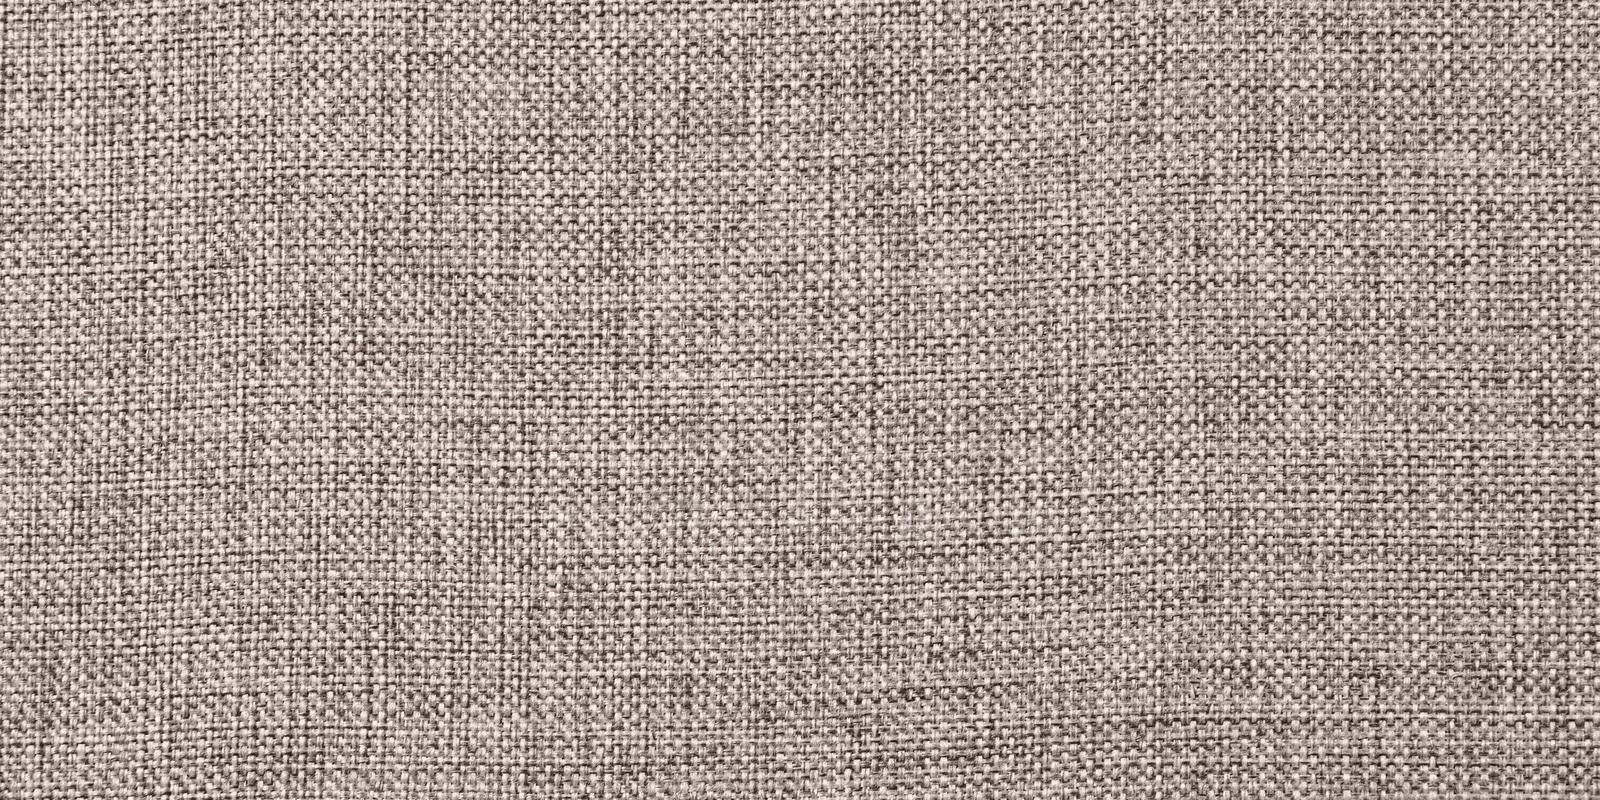 Угловой диван Атланта рогожка темно-бежевого цвета фото 8 | интернет-магазин Складно